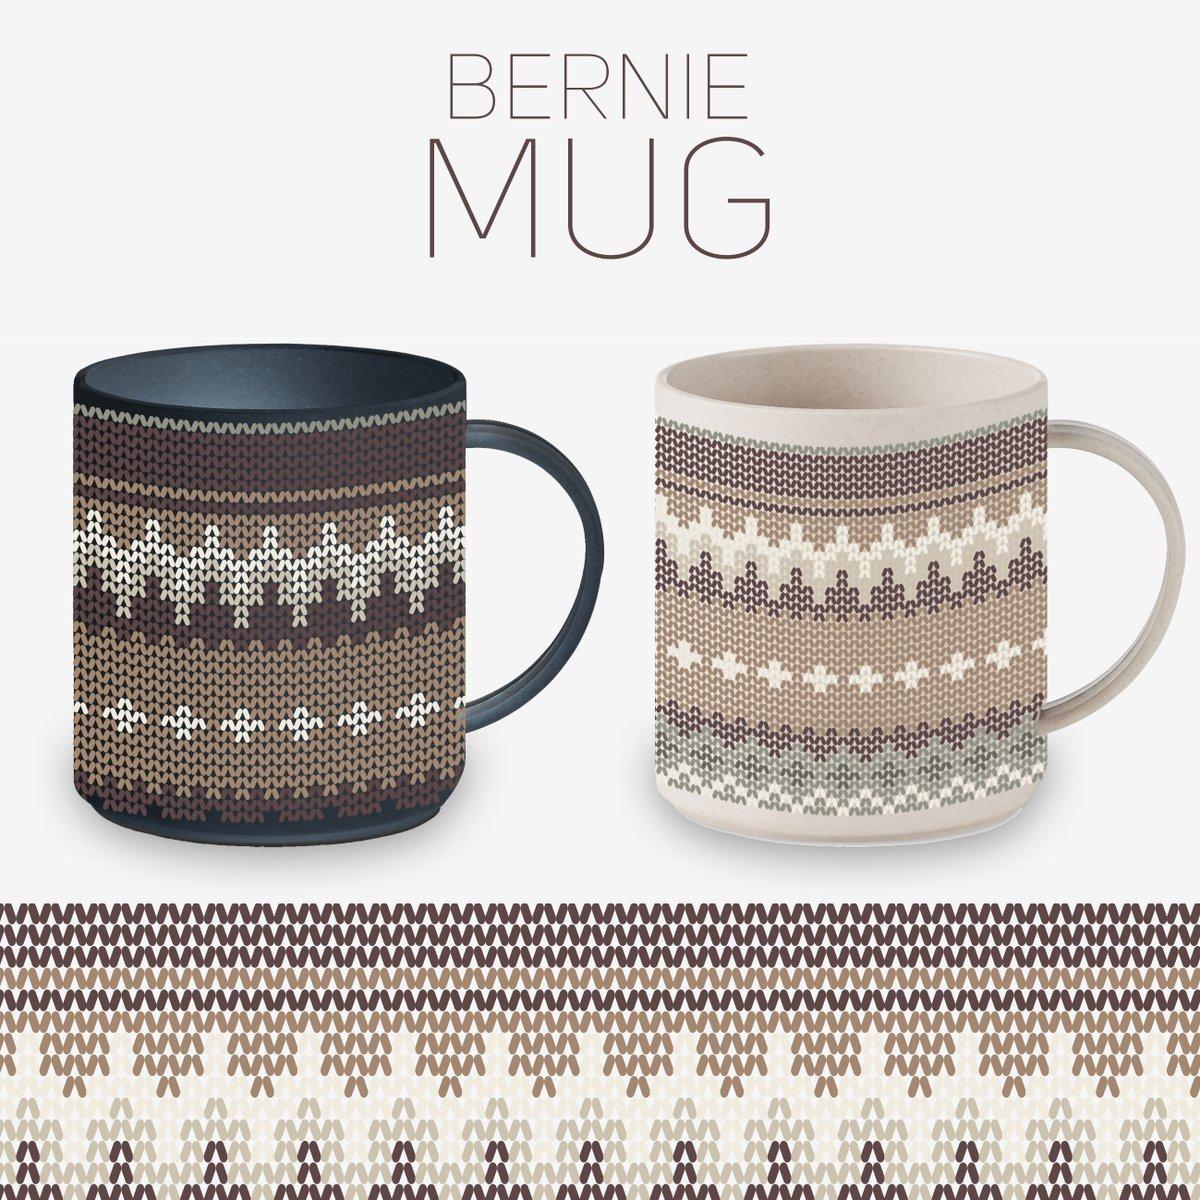 C'est assez classe en #Mug ! Tout de suite ça réchauffe ta boisson #Motif #Pattern @AdobeFrance @Photoshop @illustrator  #BernieSanders #Mittens #Jersey #tricot #knitting #BernieSandersMittens #SandersMeme #sandersmug